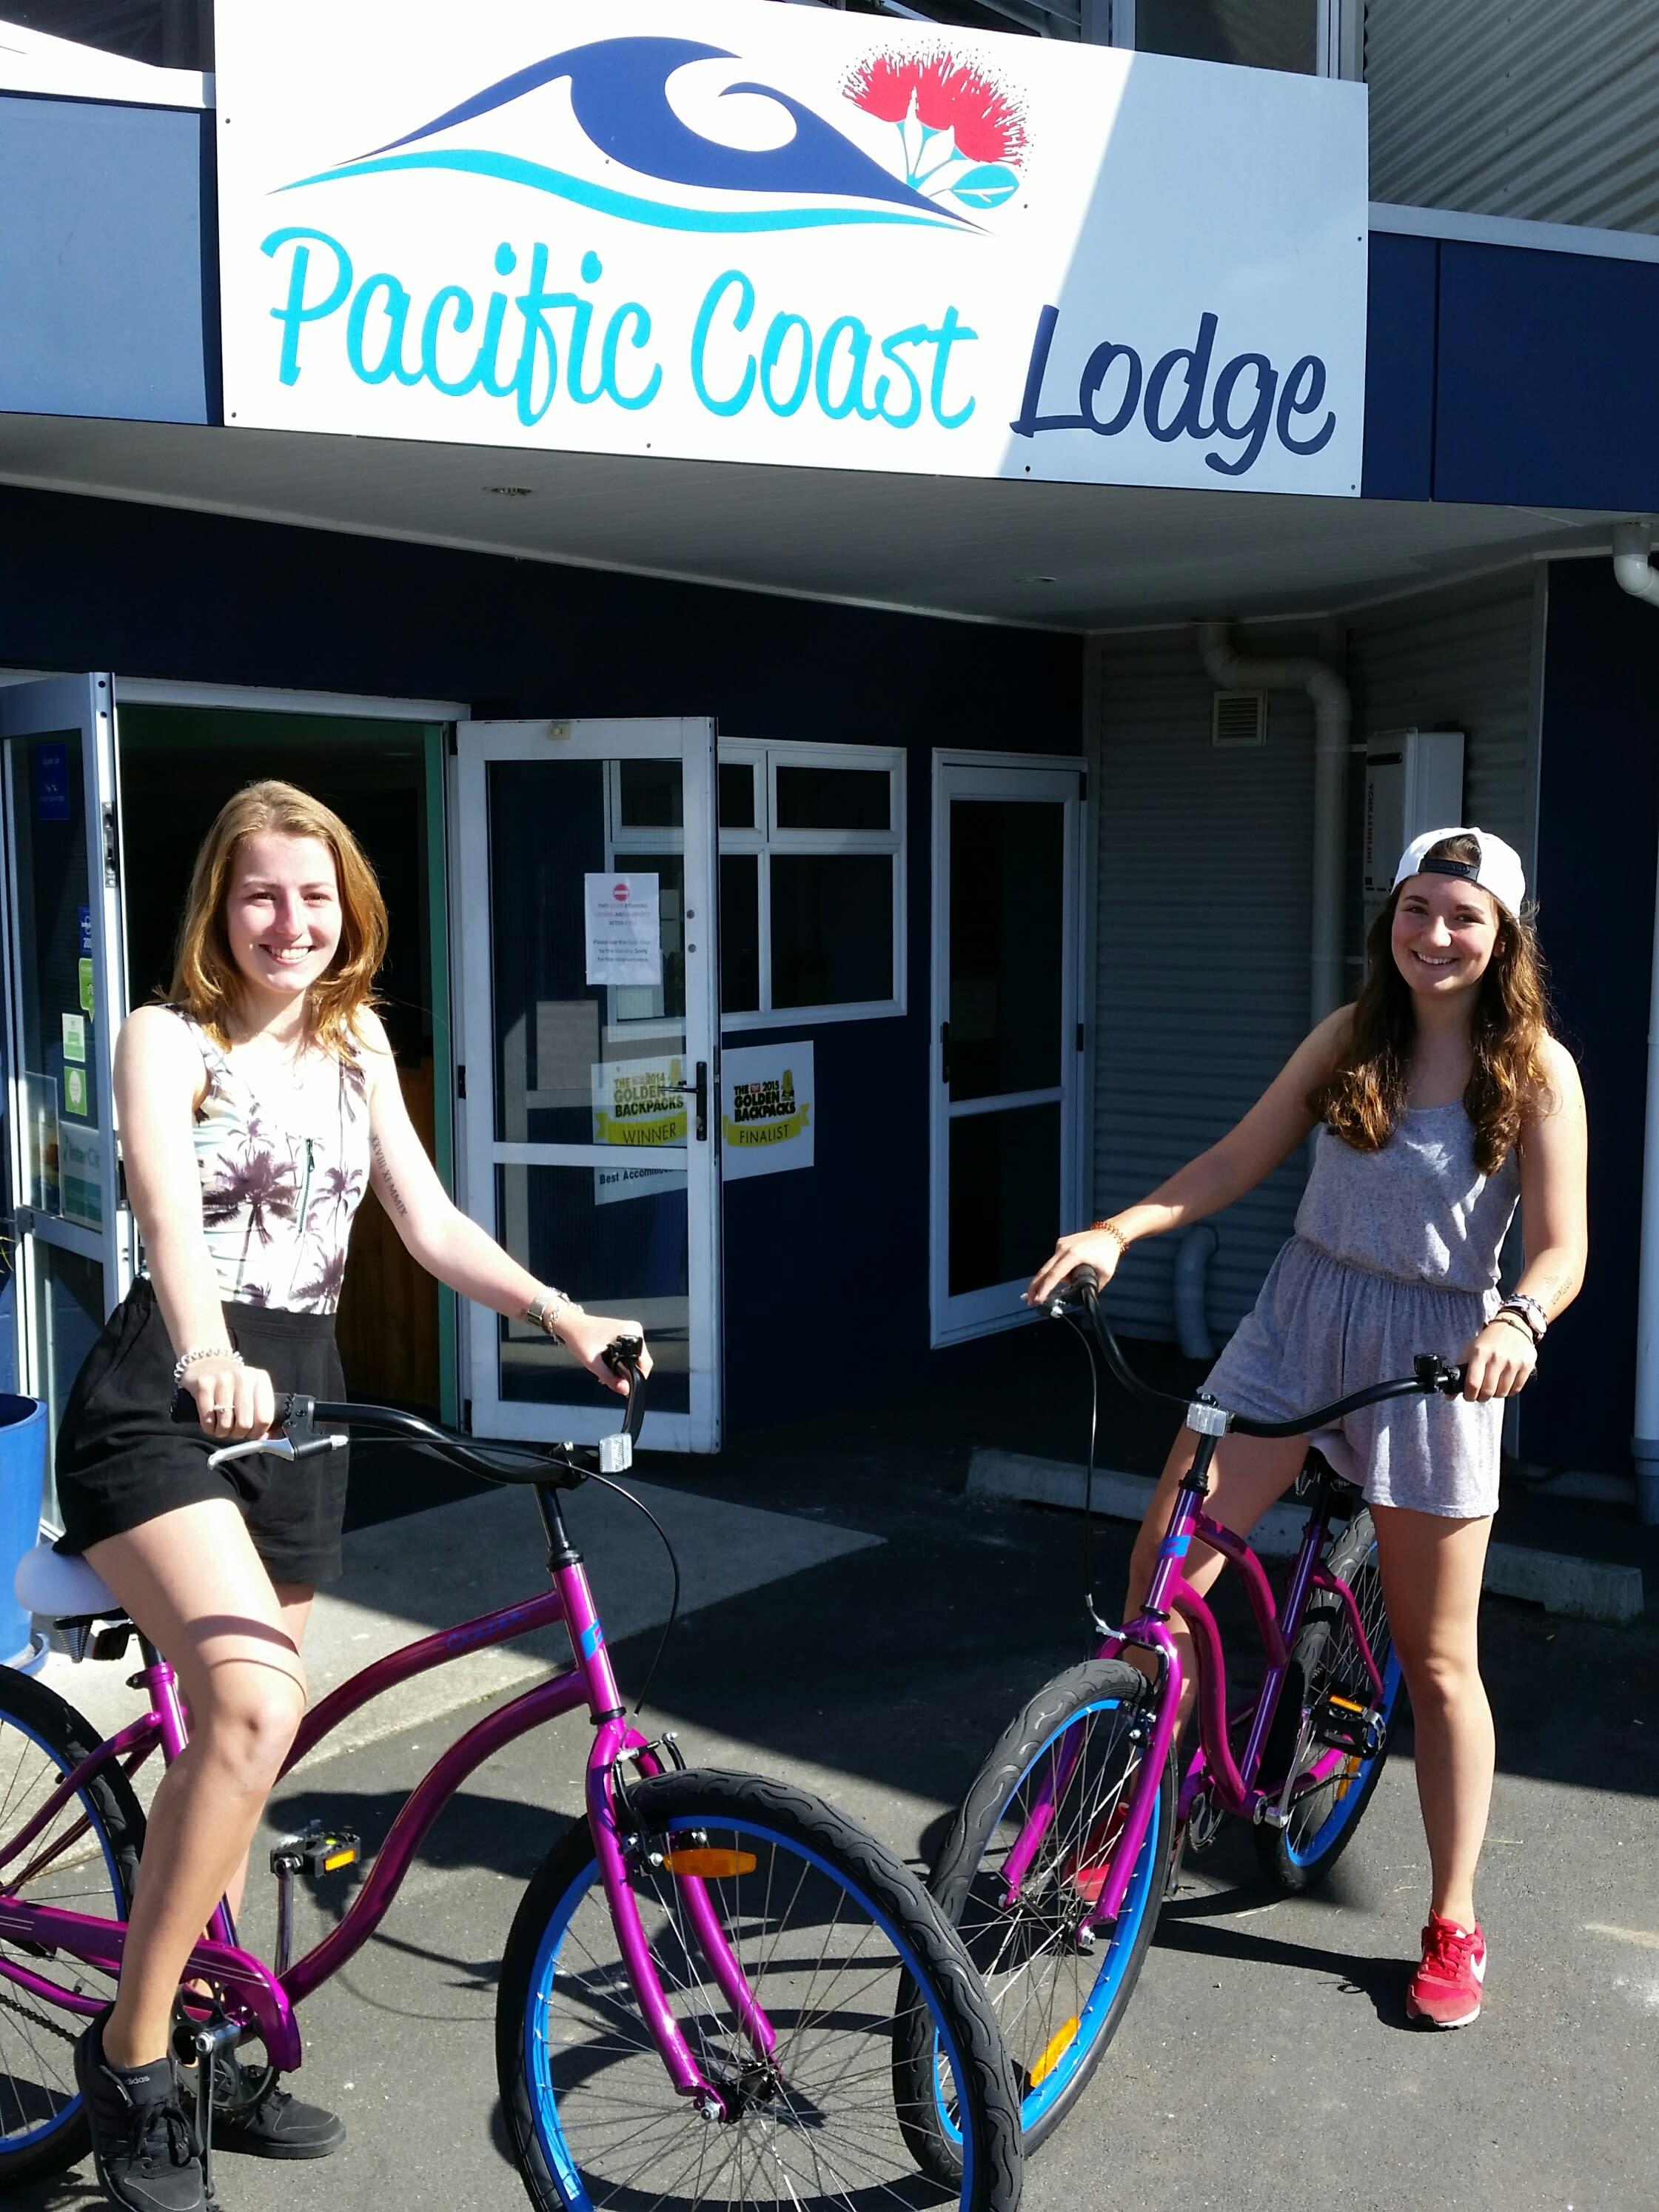 Pacific Coast Backpackers Lodge